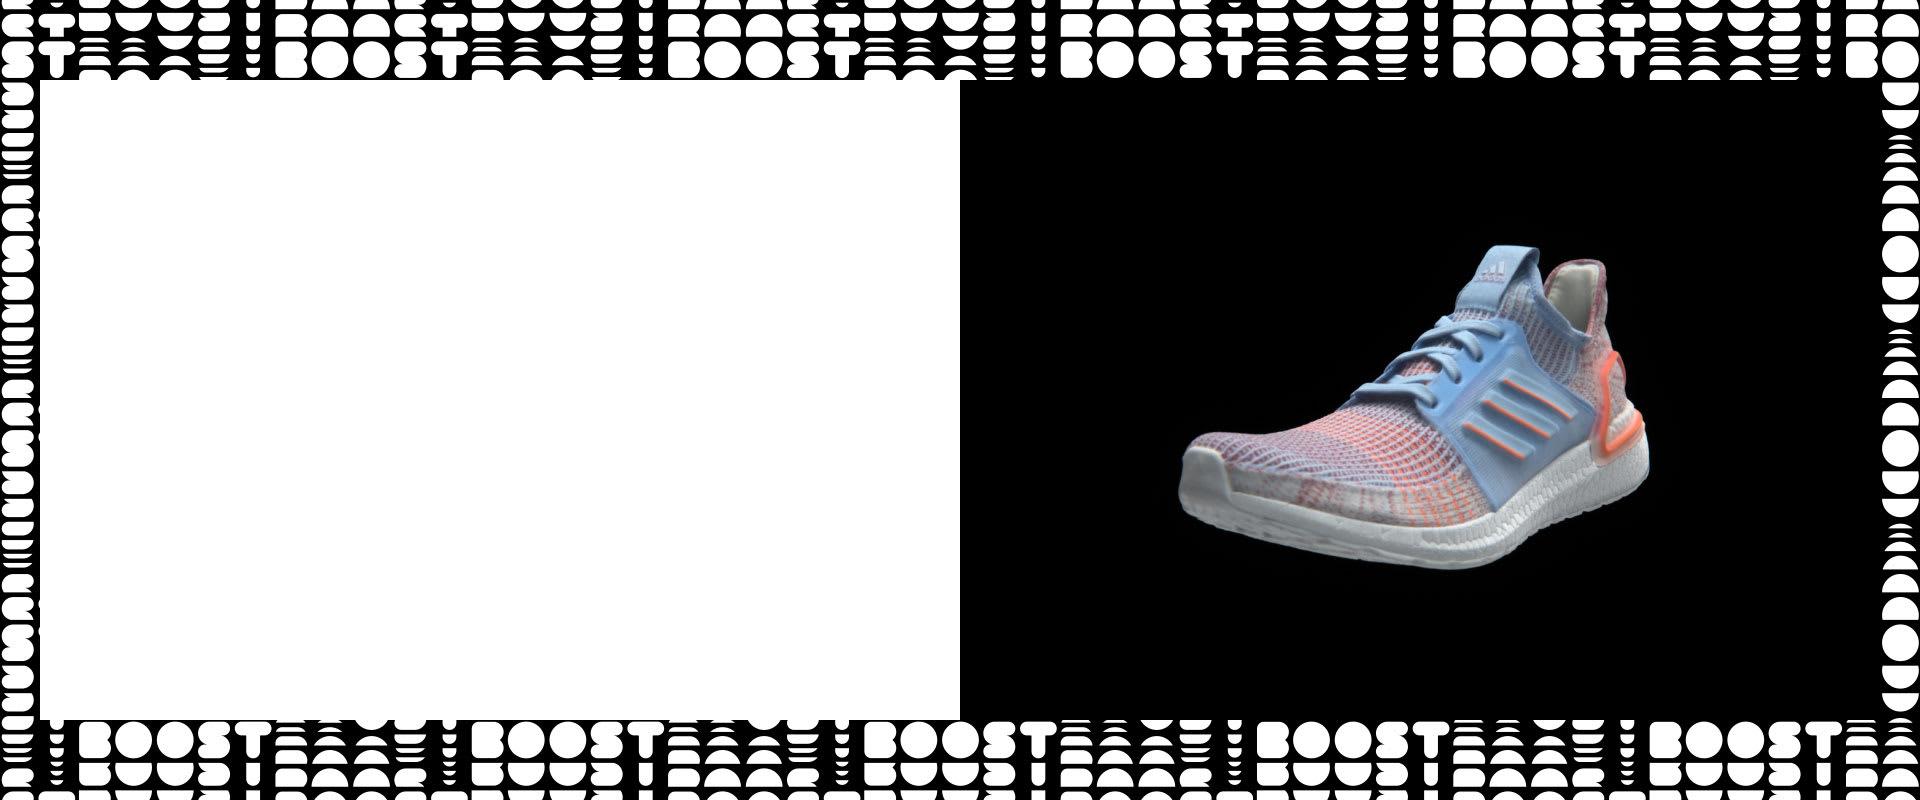 885a2a97 adidas® Online Shop Norge |Sportsklær